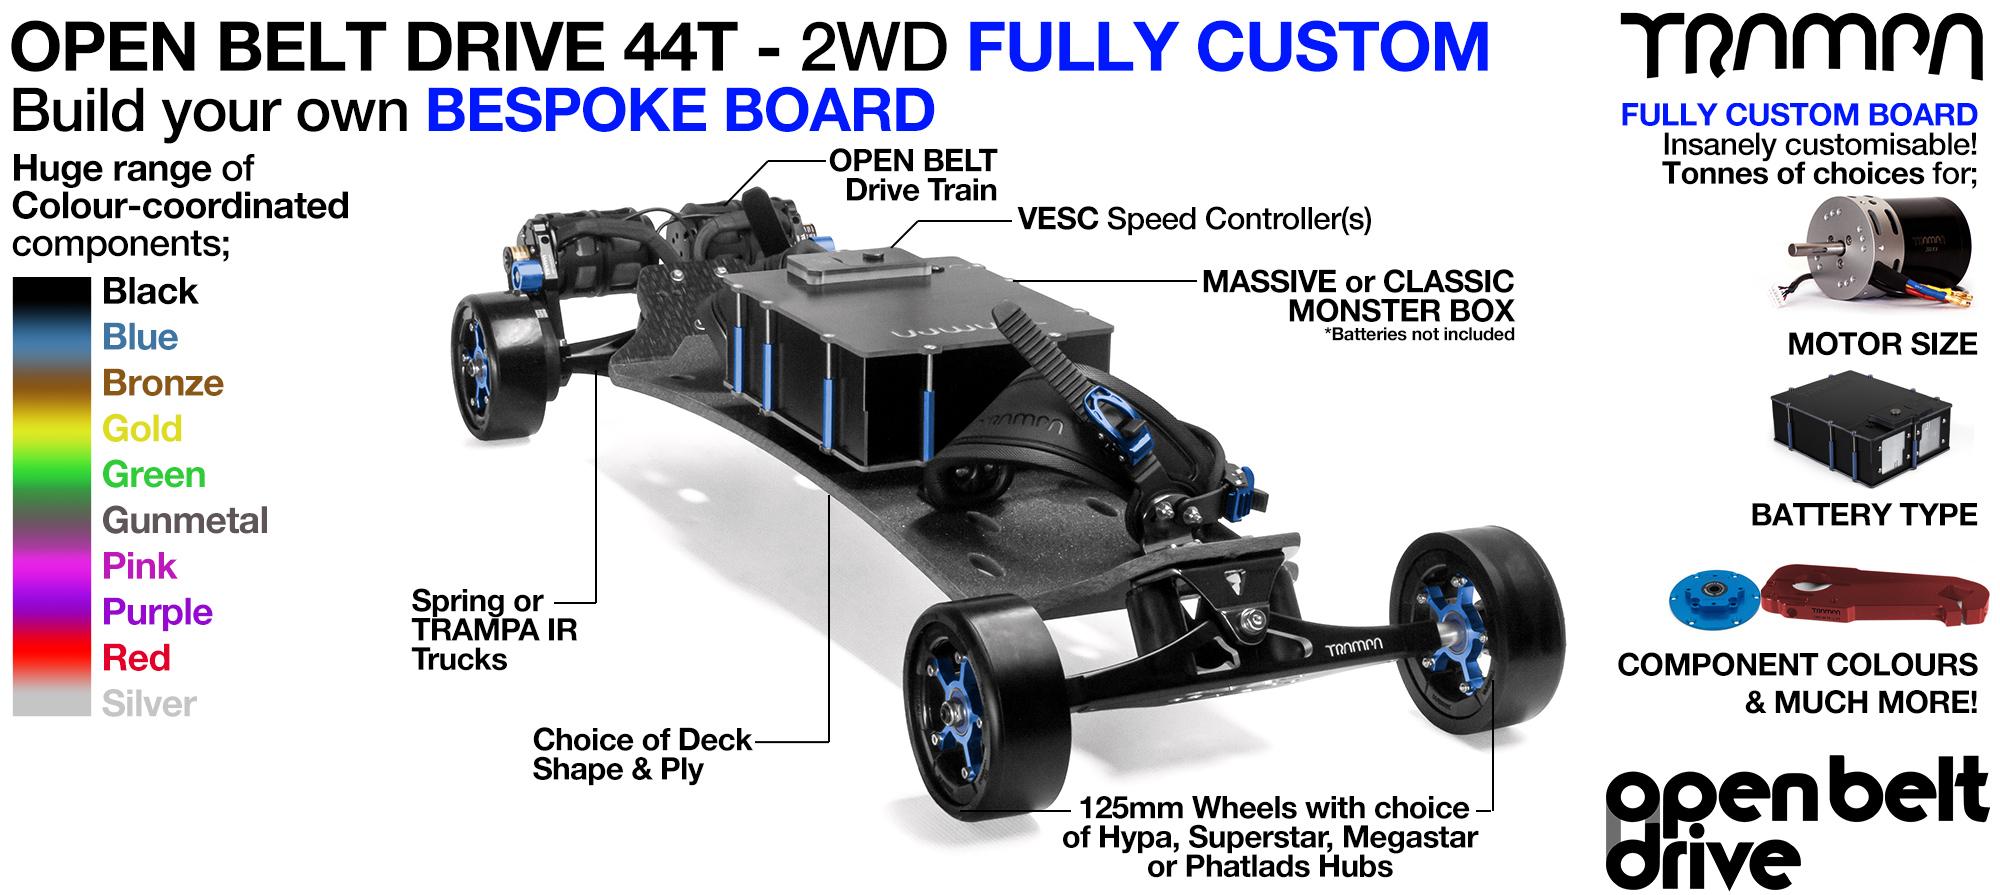 2WD 66T Open Belt Drive TRAMPA Electric Mountainboard with 125mm GUMMIES Giant Longboard Wheels & 44 Tooth Pulleys - CUSTOM